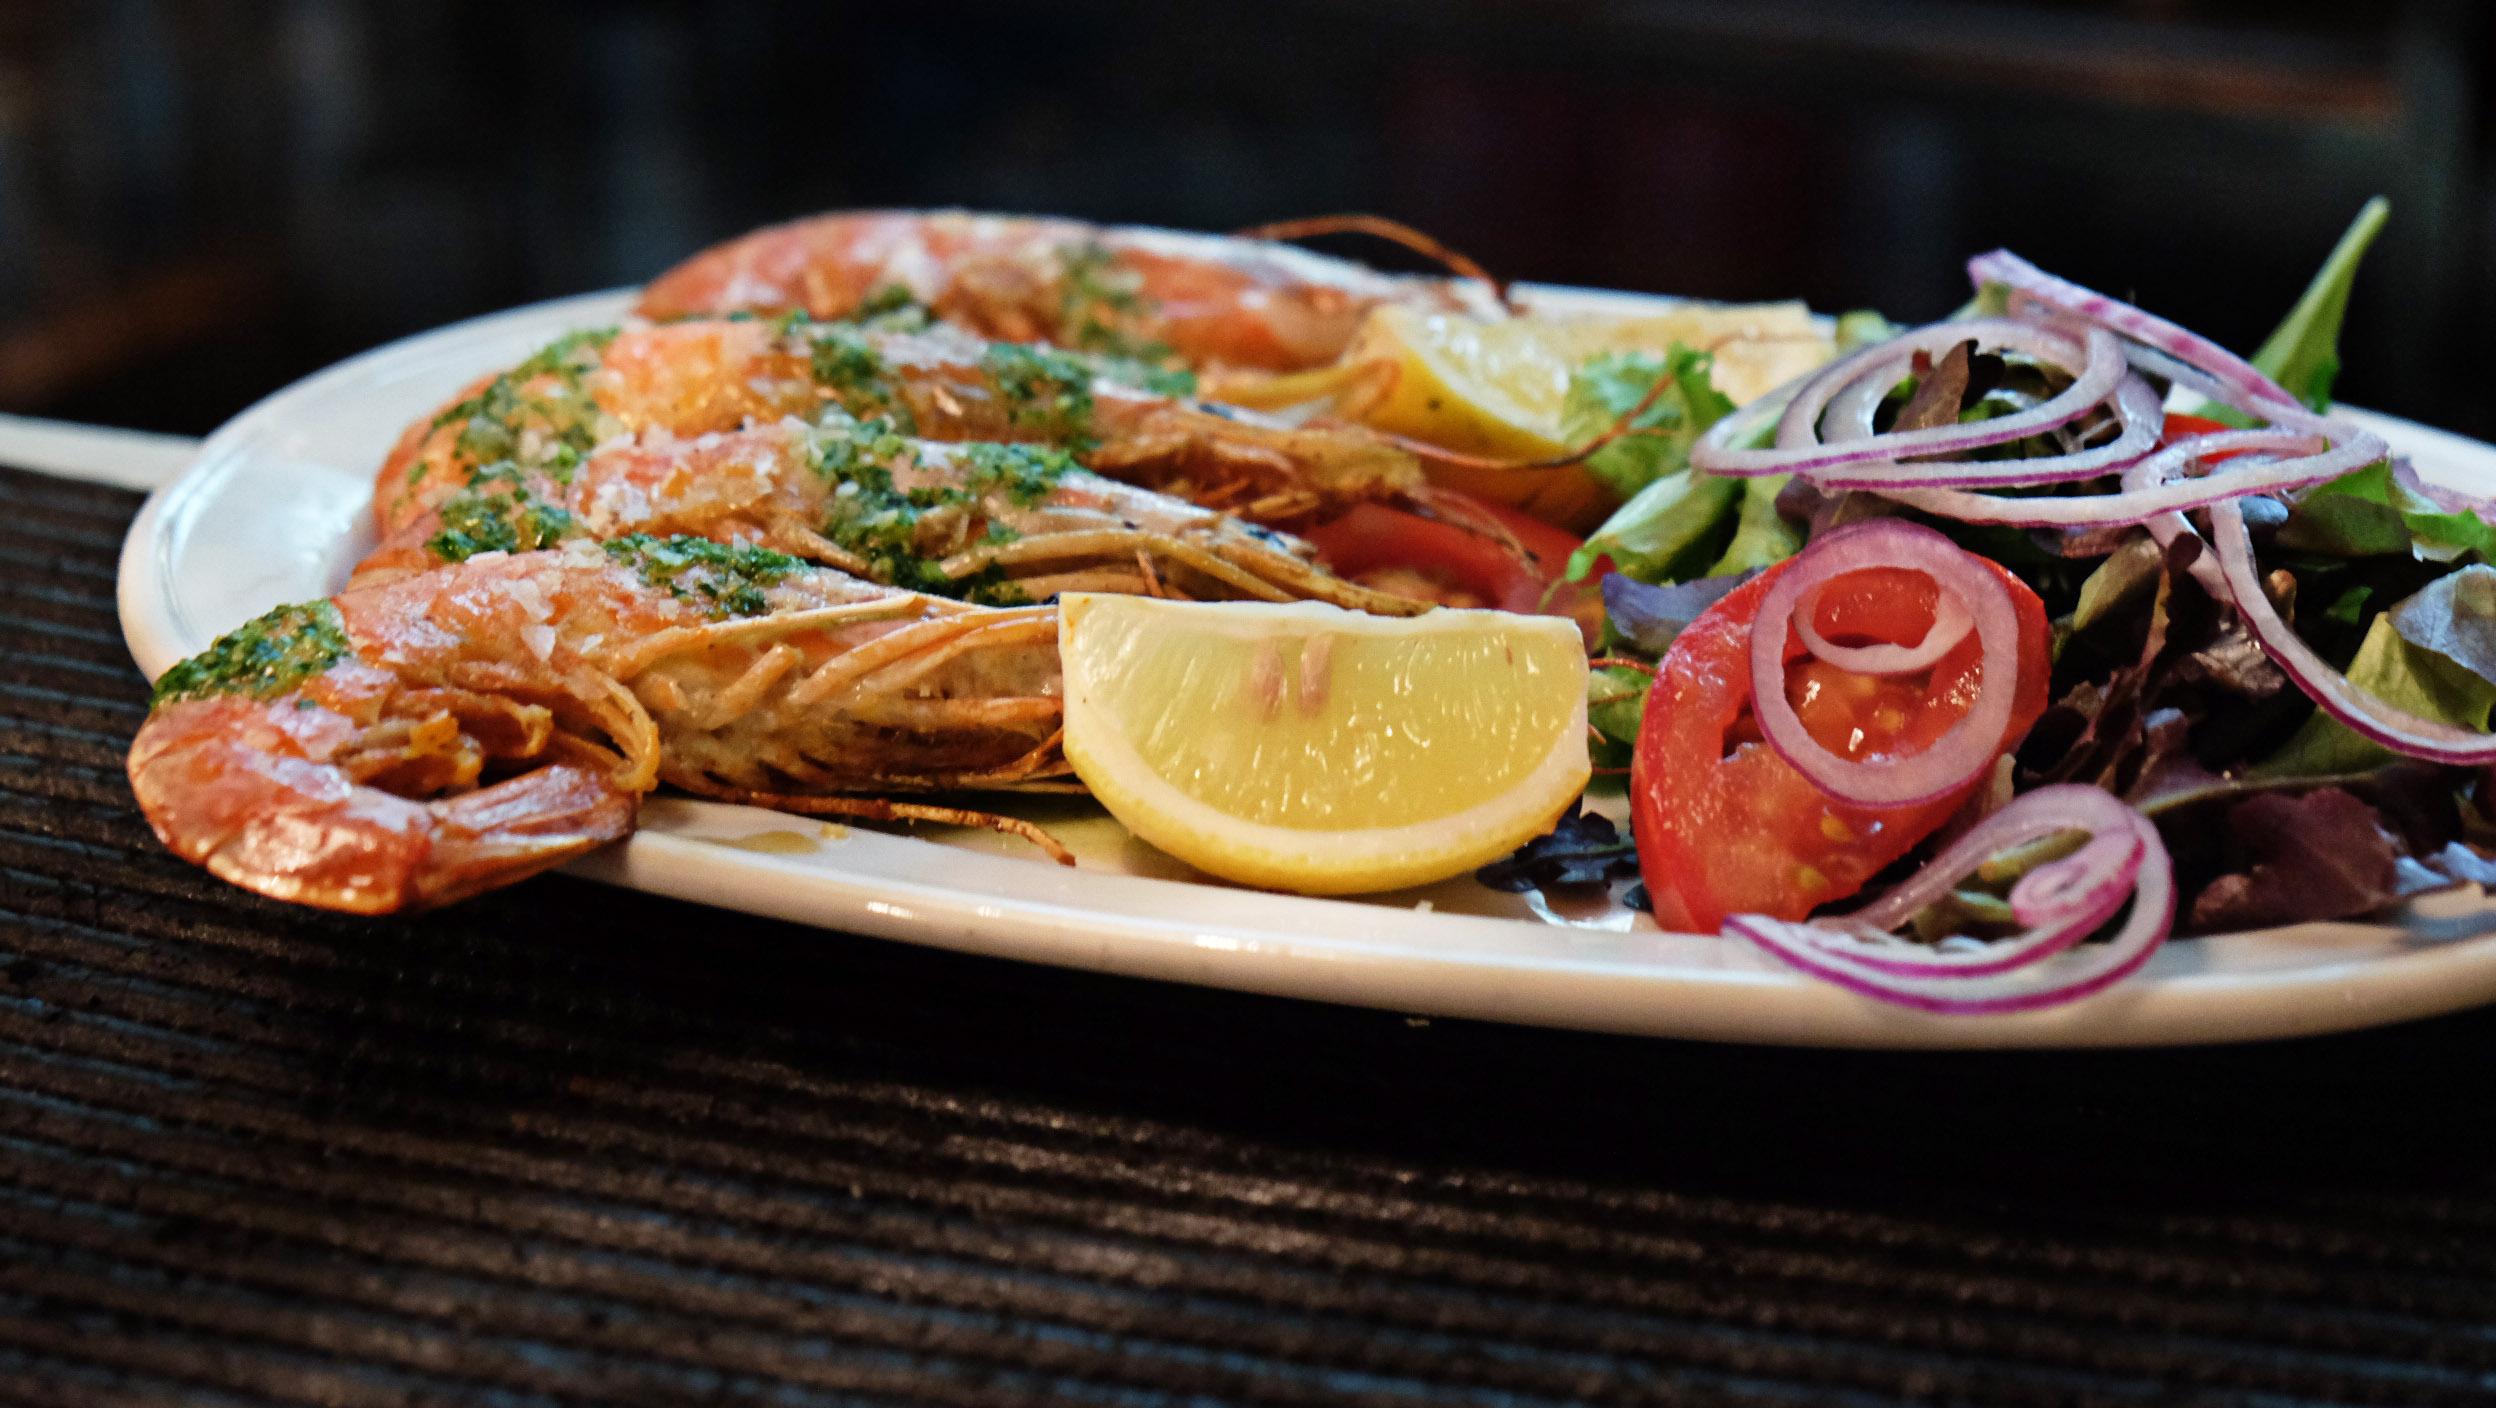 Cocina mediterránea tradicional